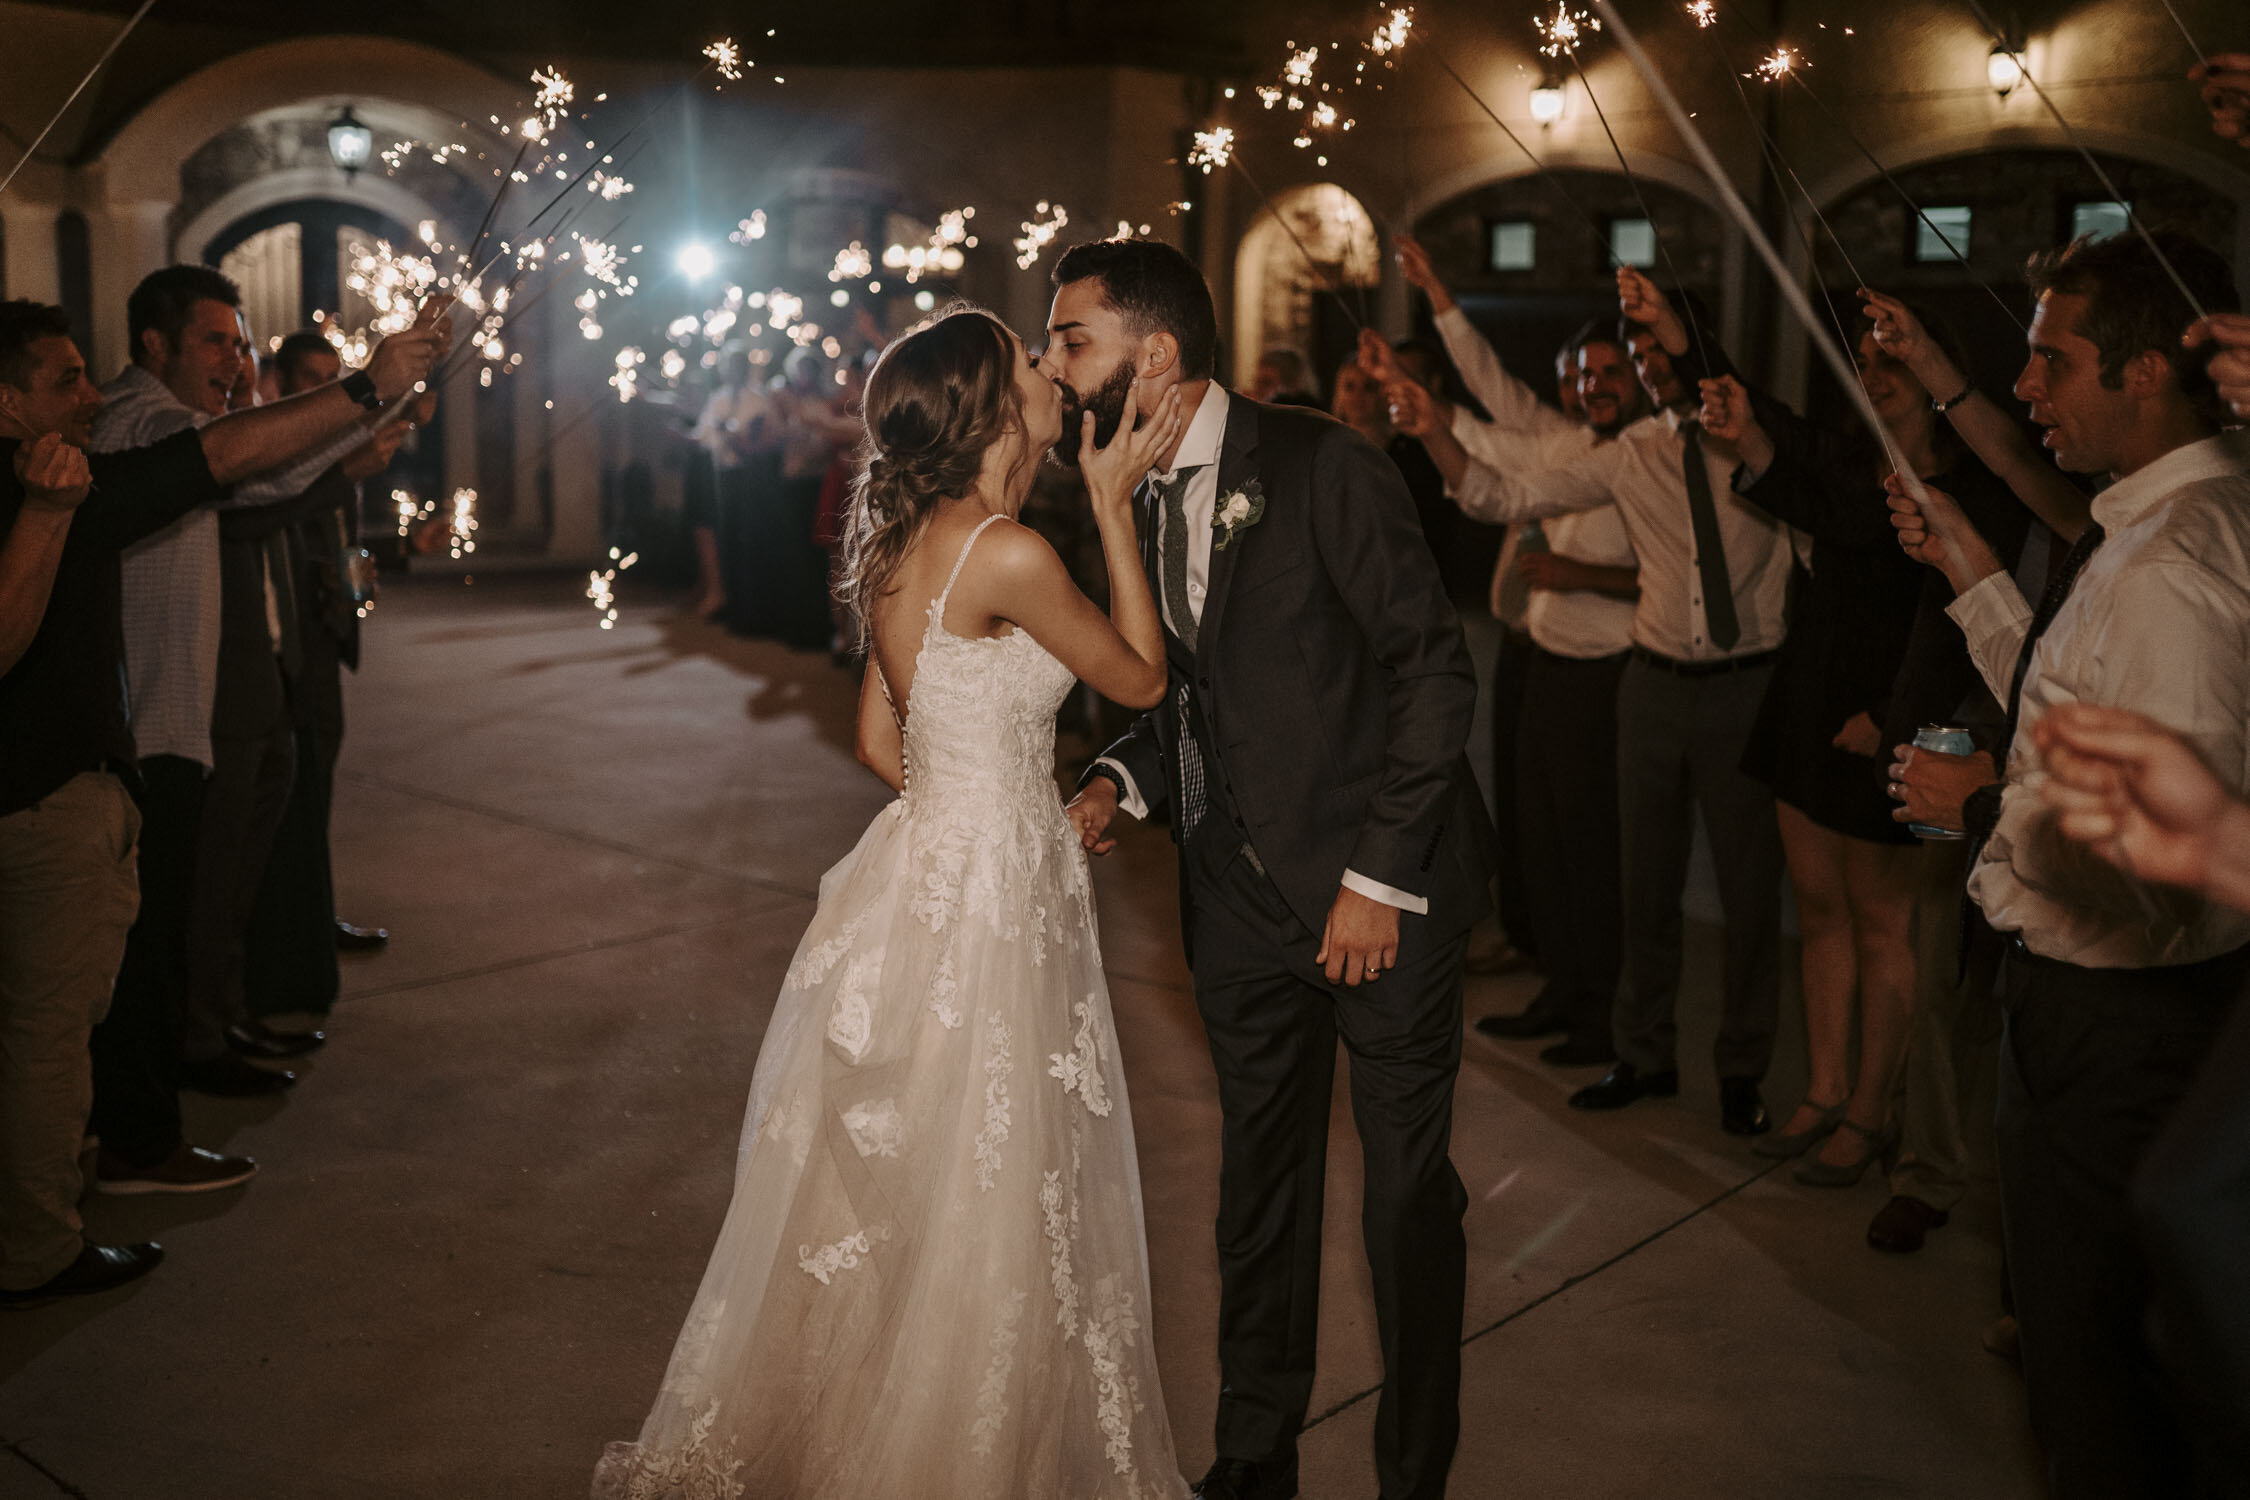 Rustic and Romantic Wedding Reception, Sparkler Exit at Bella Collina   By Greensboro, NC Wedding Photographer: Kayli LaFon Photography